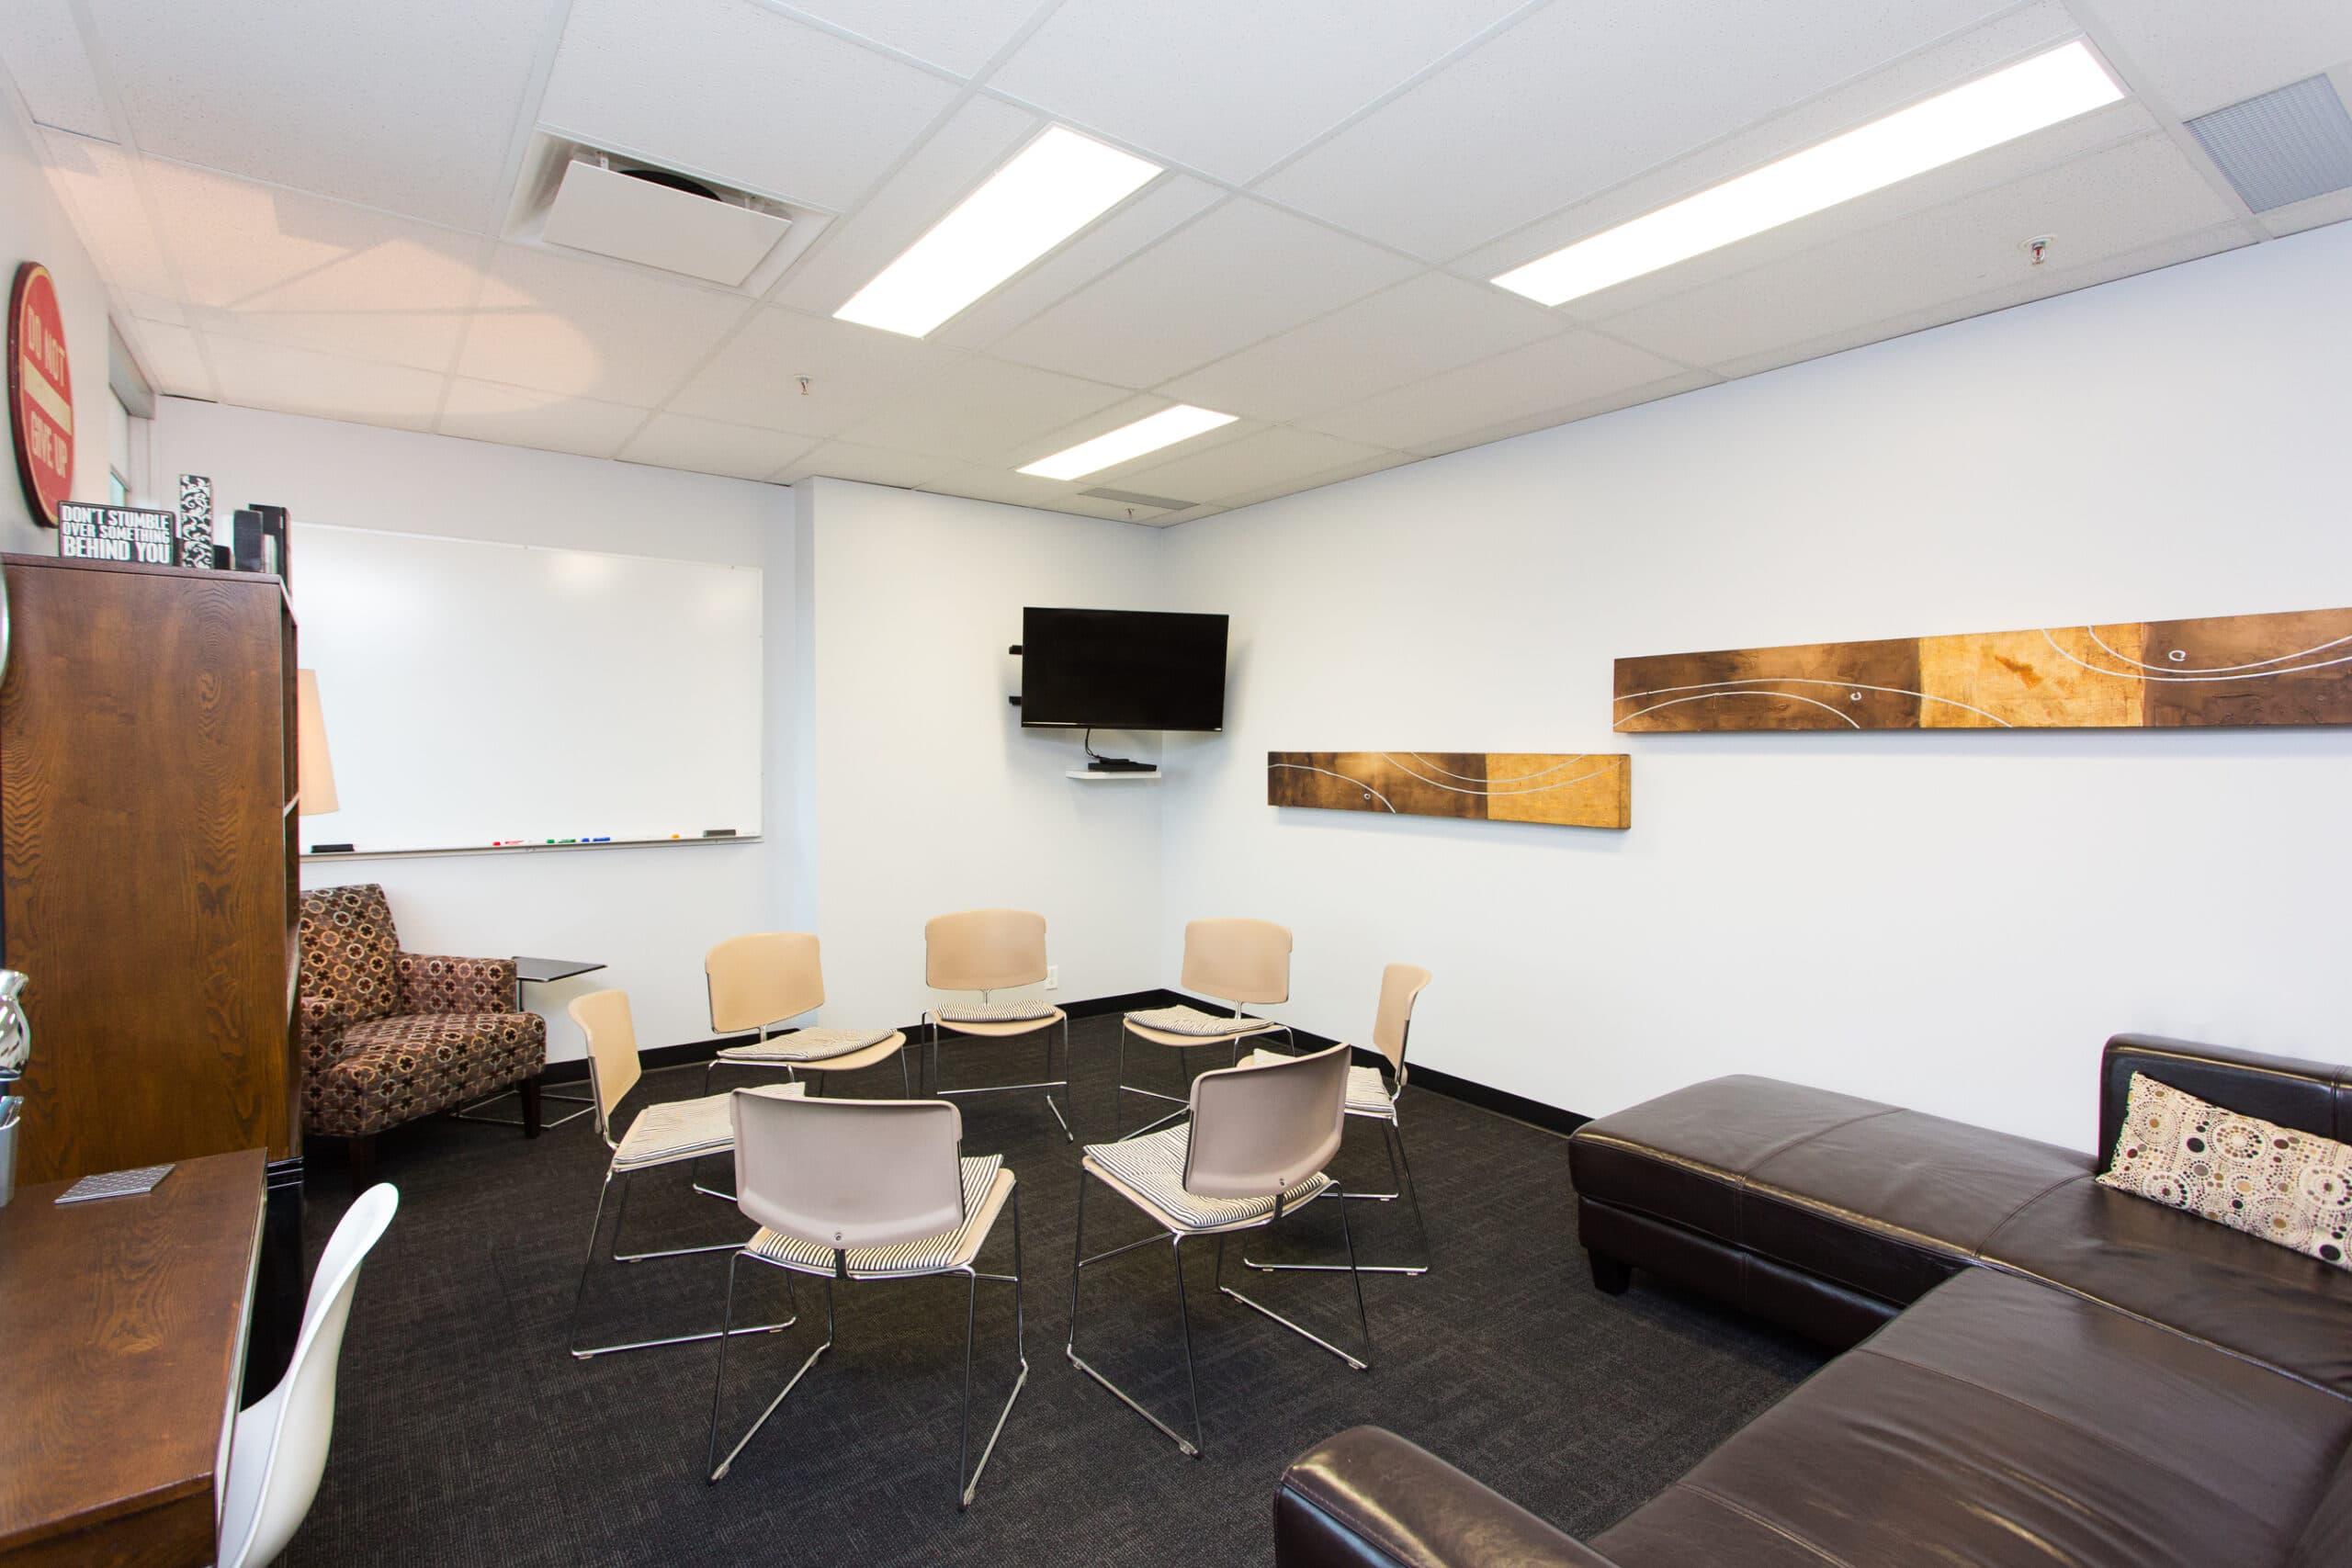 West Broadway, Vancouver Clinic - Jericho Counselling - Suite 1004 - 750 West Broadway, Vancouver, BC V5Z 1H9 Canada